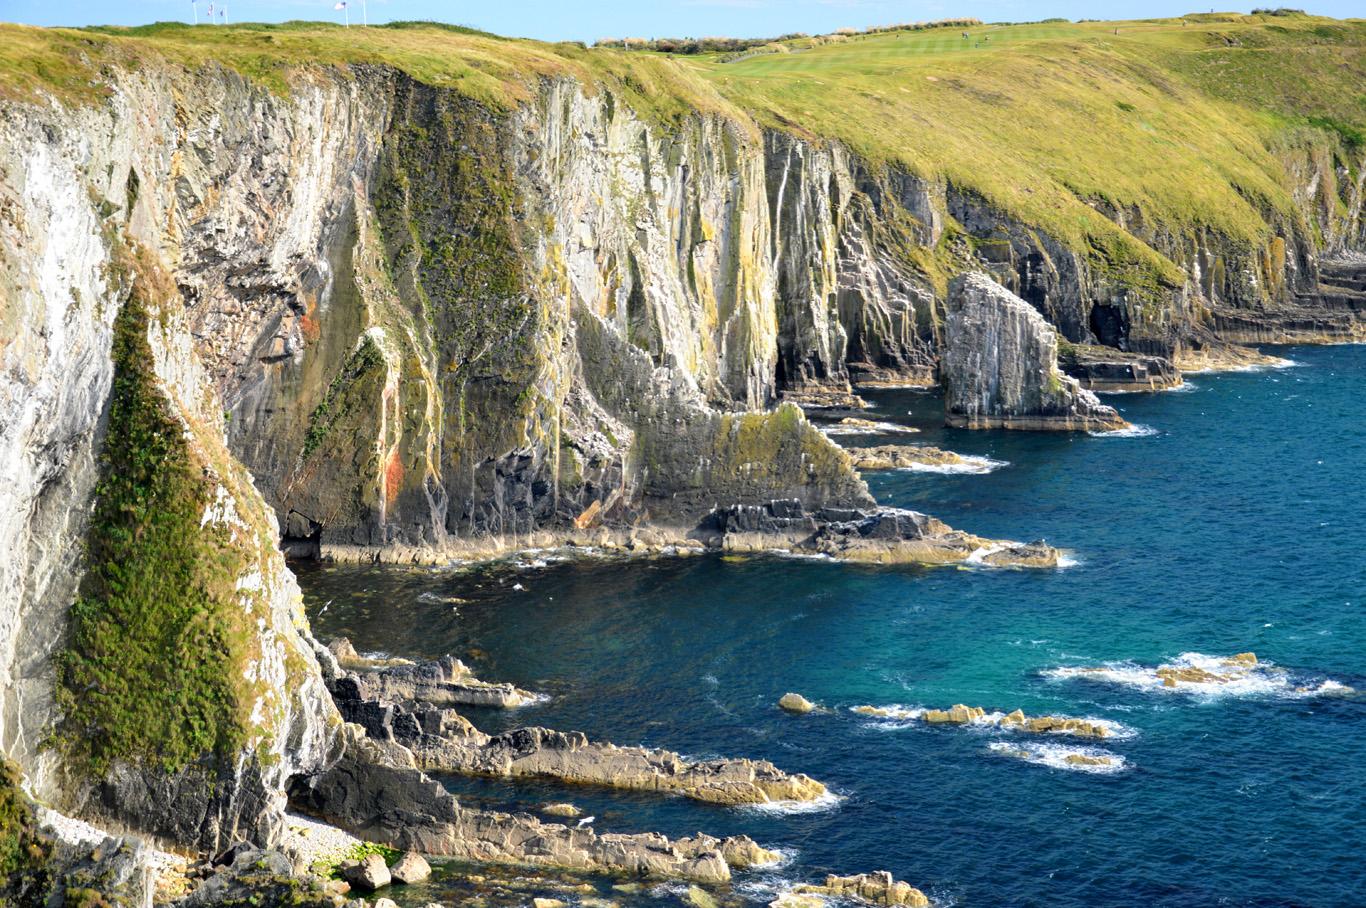 Cliffs at Old Head of Kinsale